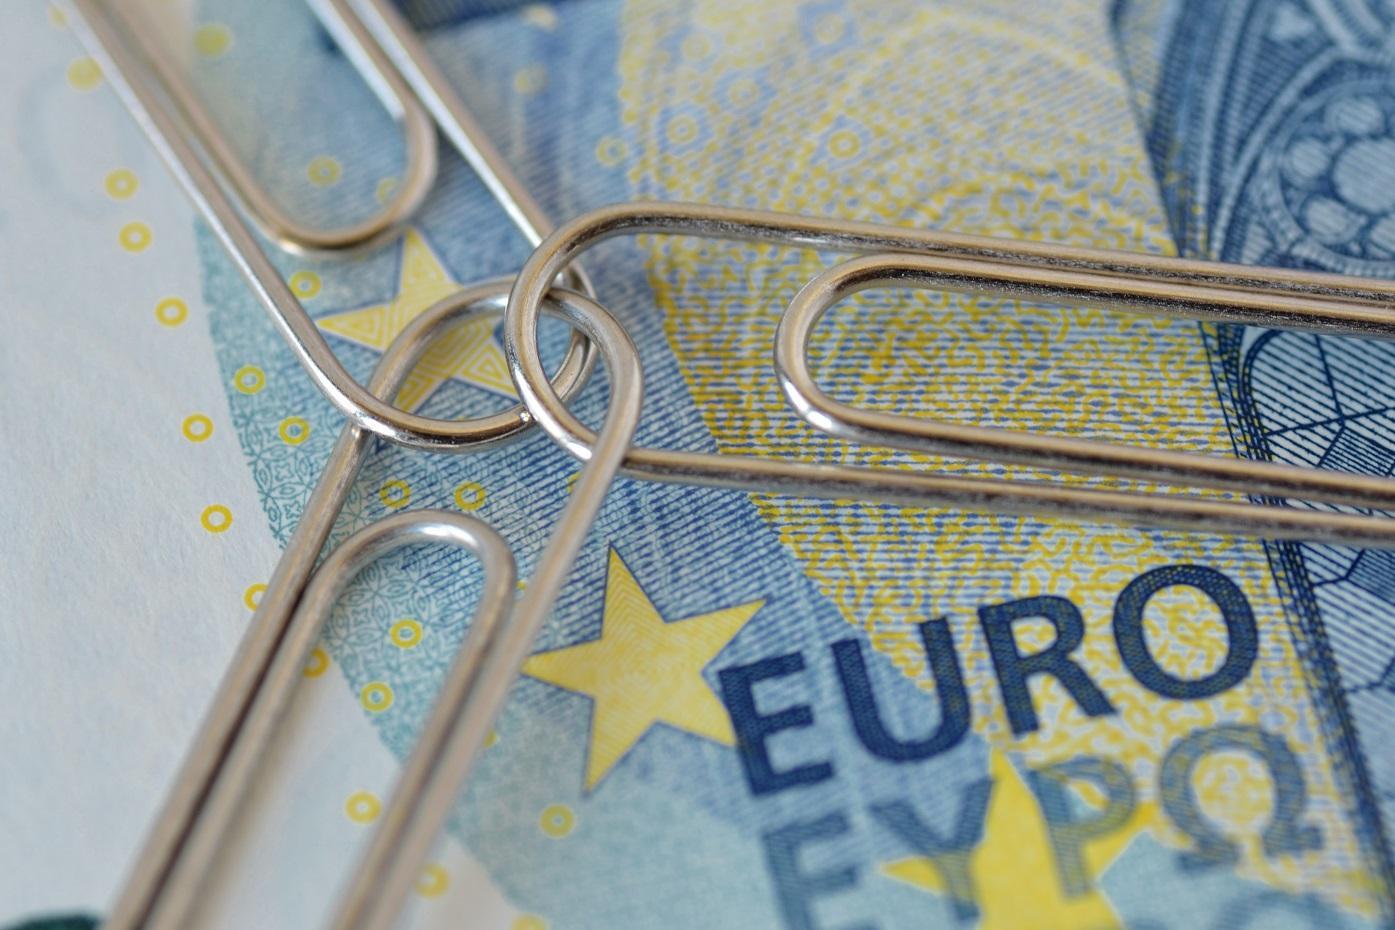 Európai Unió, uniós pénz